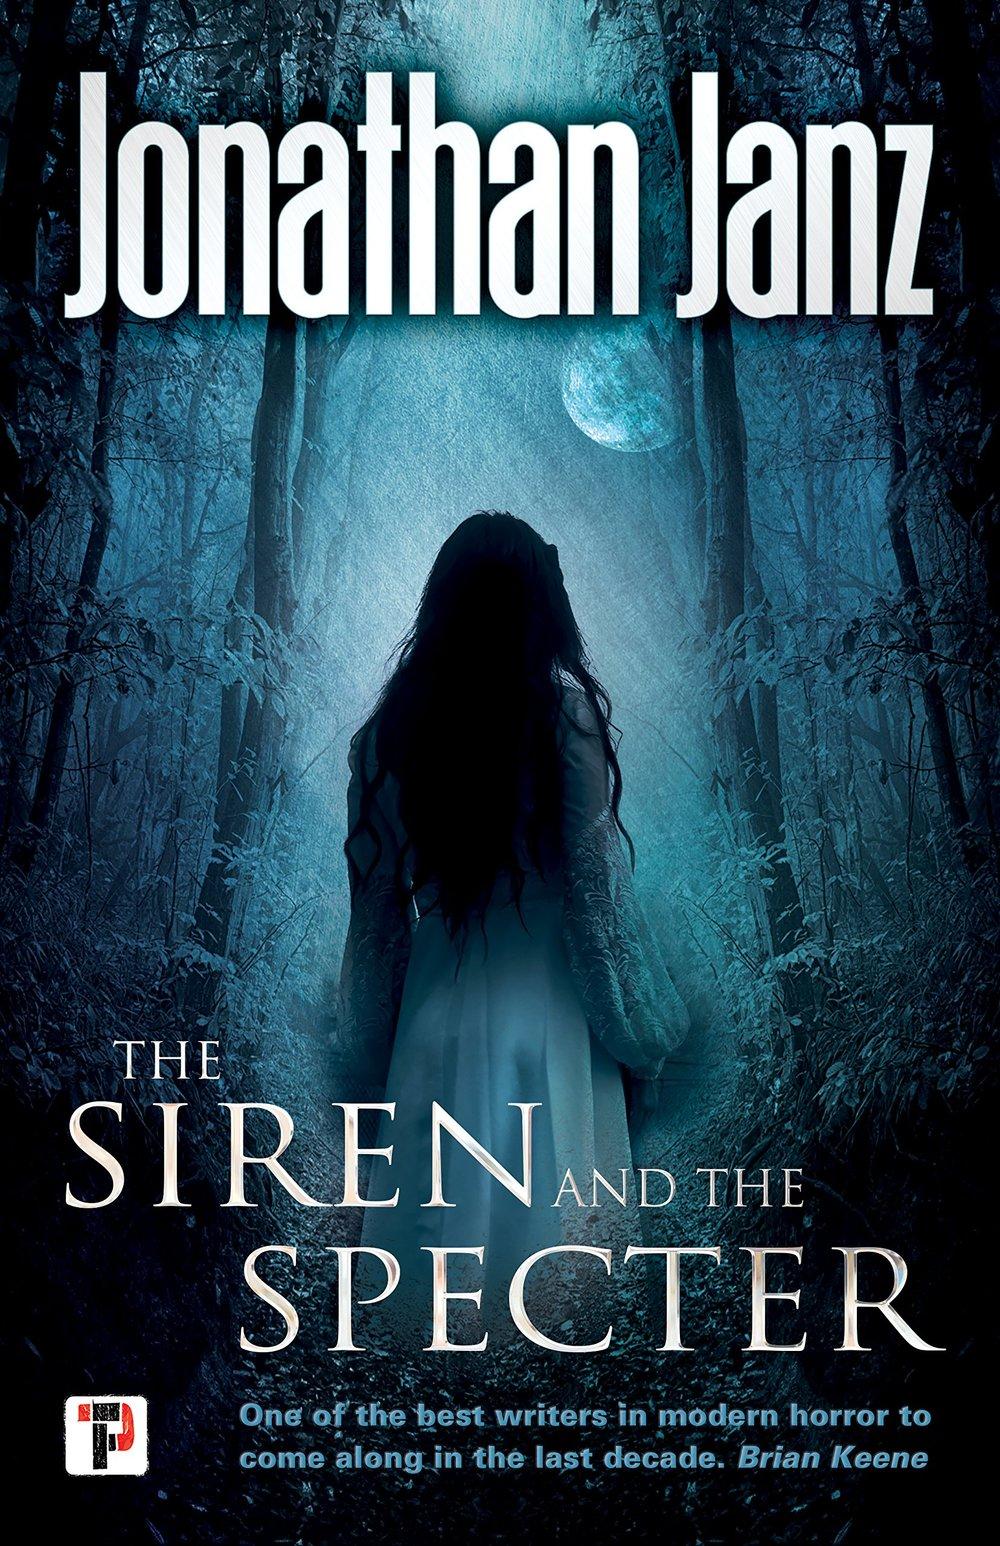 the siren and the specter_jonathan janz.jpg